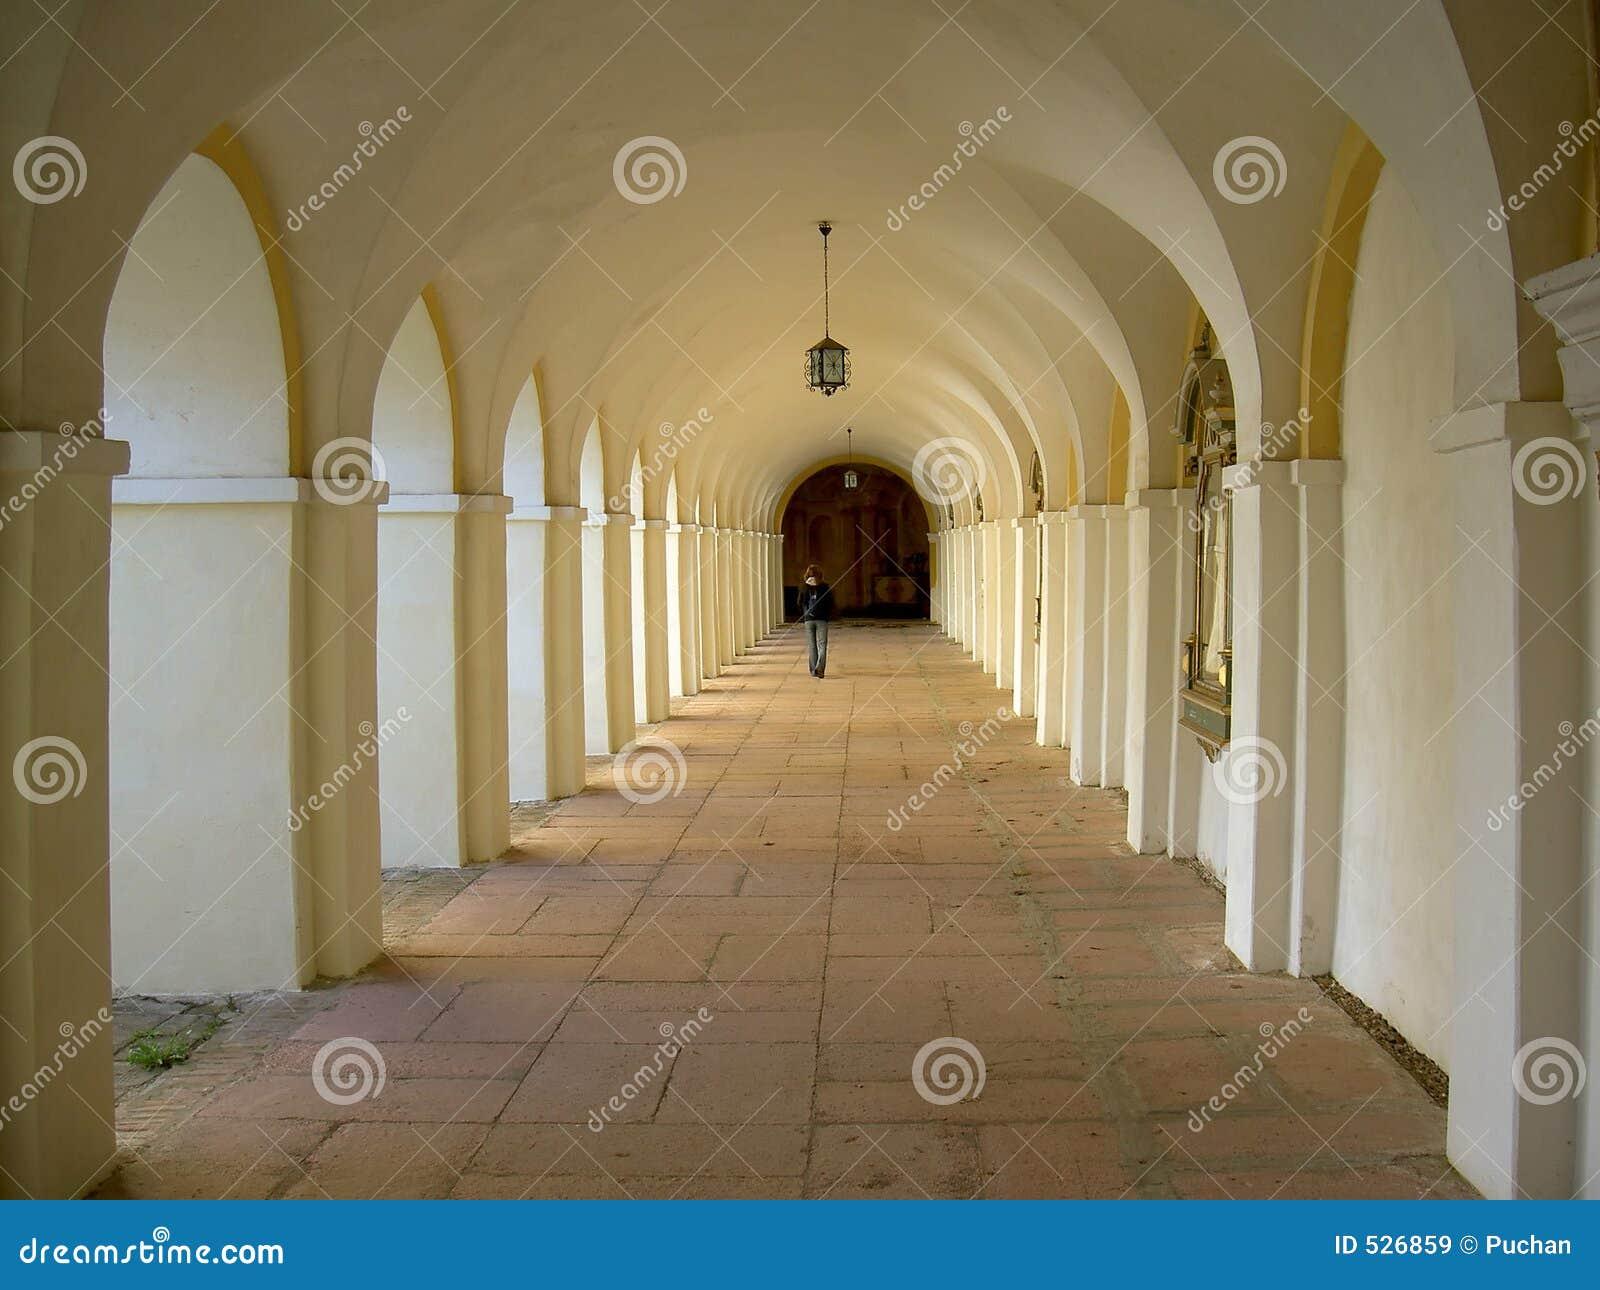 Download 老教会 库存图片. 图片 包括有 黄色, 波兰, 夏天, 宗教信仰, 拱道, 巡回表演者, 旅行, 欧洲, 教会 - 526859